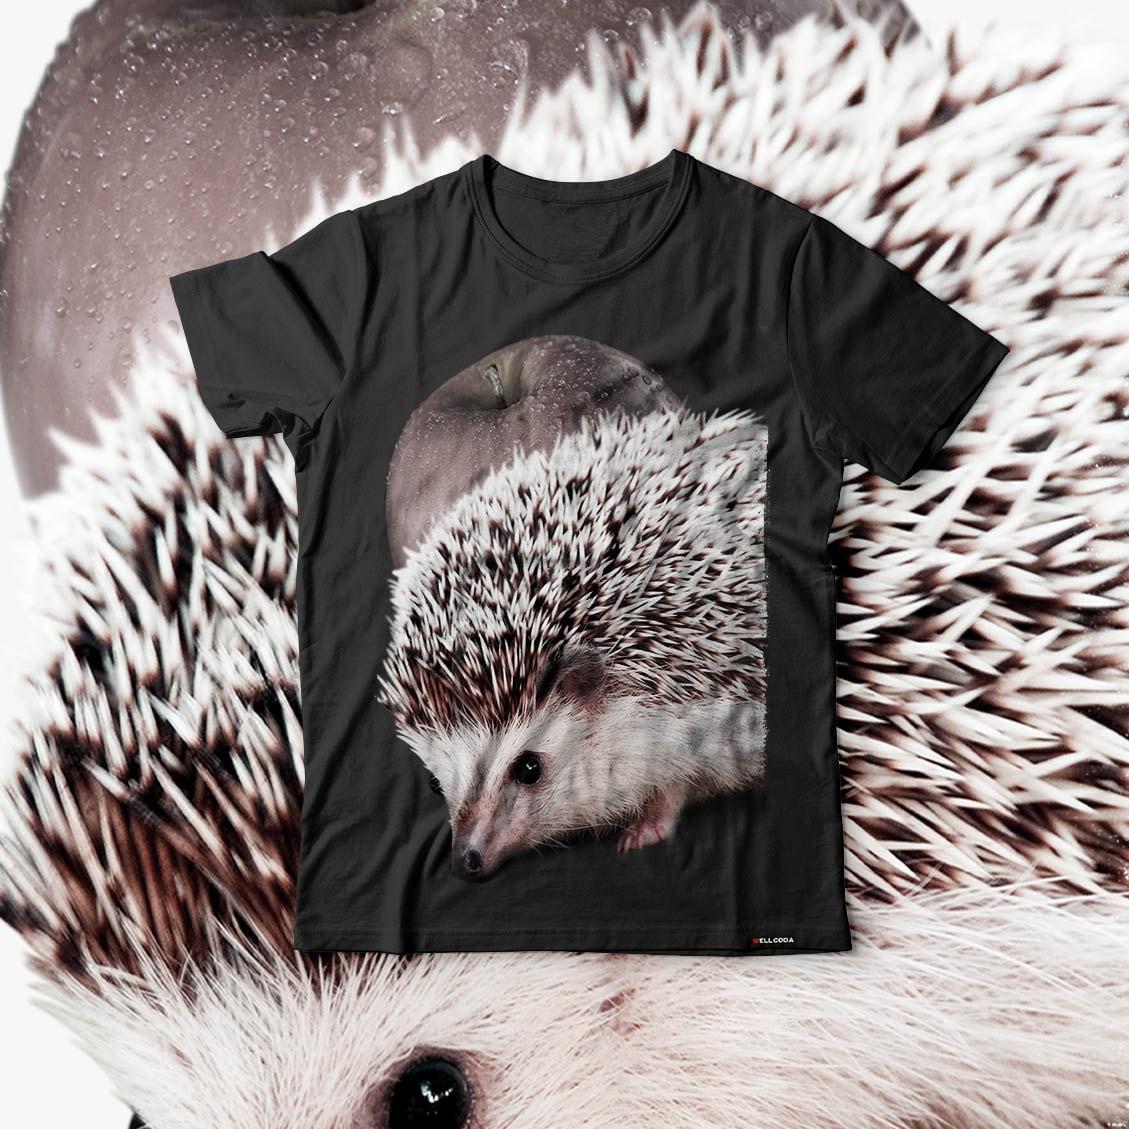 Hedgehog Apple Fun Cute Animal Men Black Tshirt S5XL NEW  Wellcoda